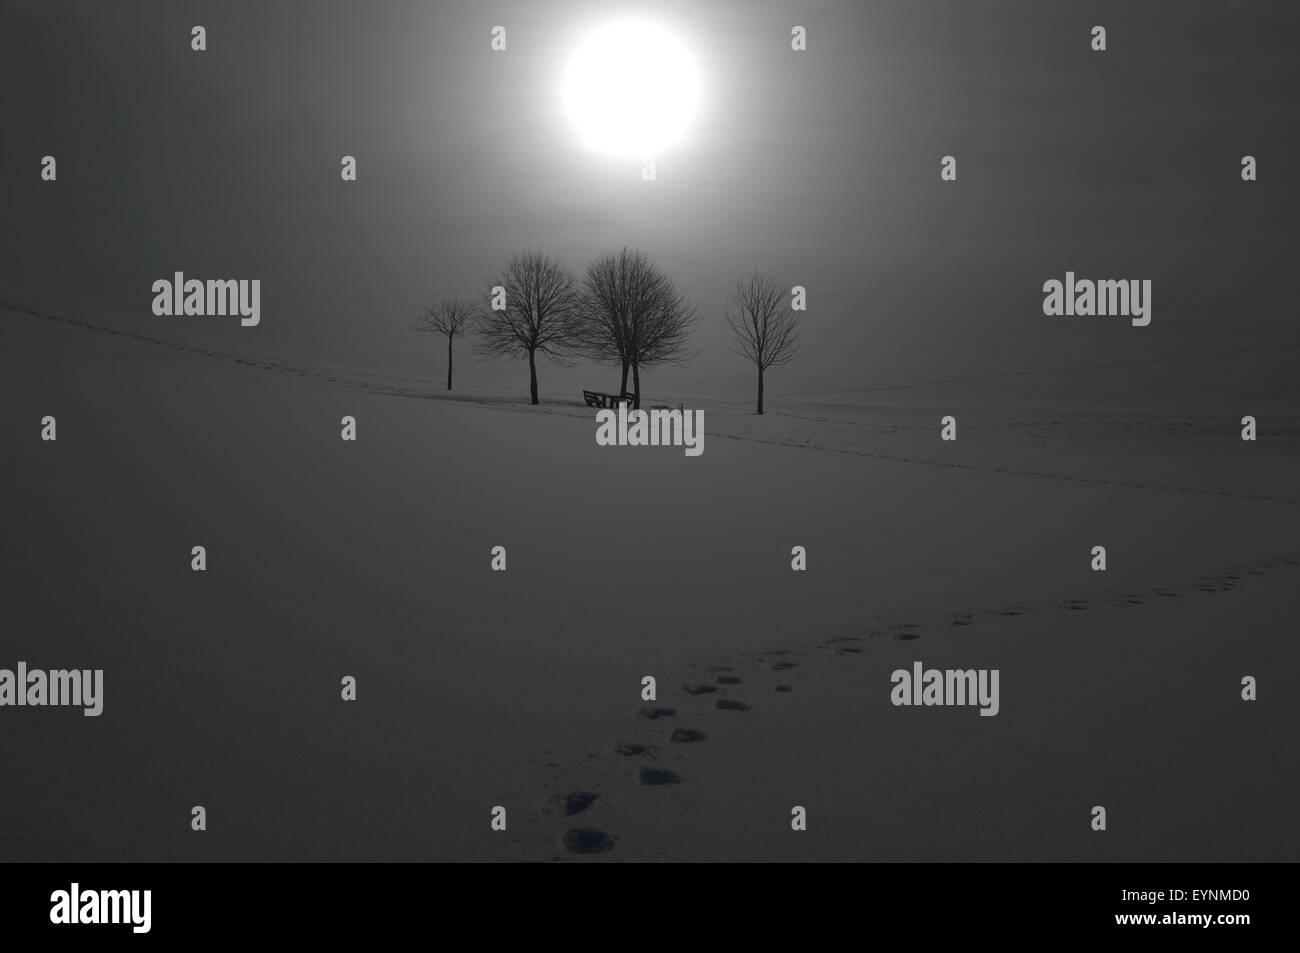 Winterimpression, Nebel, Beleuchtungsfilter - Stock Image